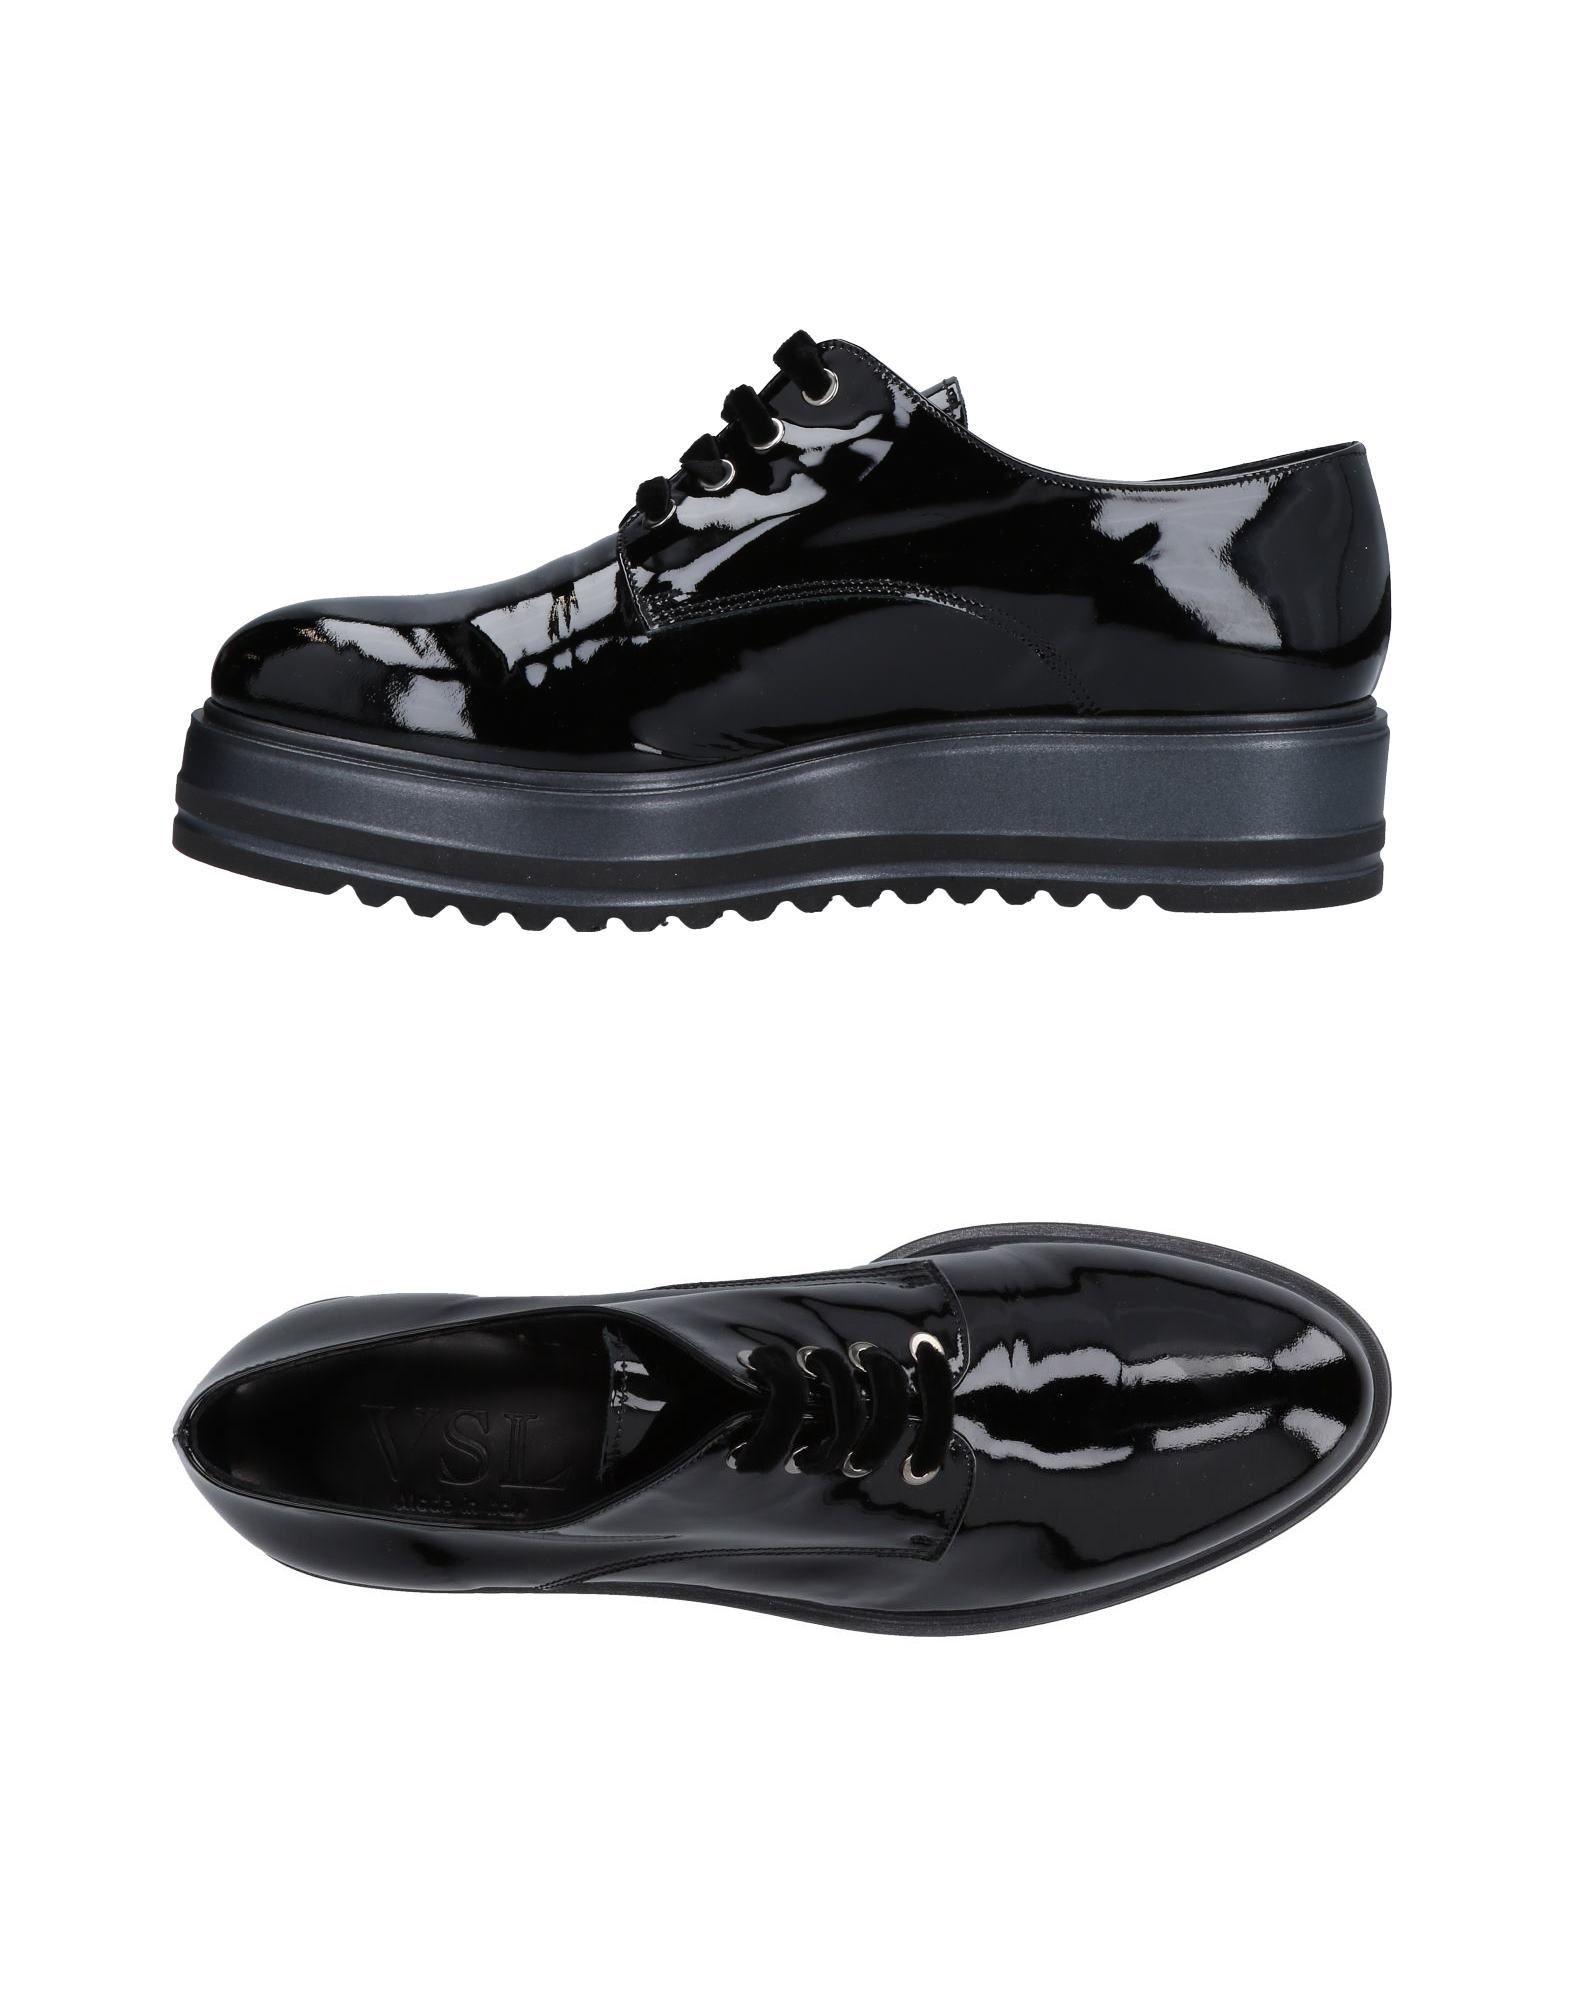 Vsl Schnürschuhe Damen  11498163CU Gute Qualität beliebte Schuhe